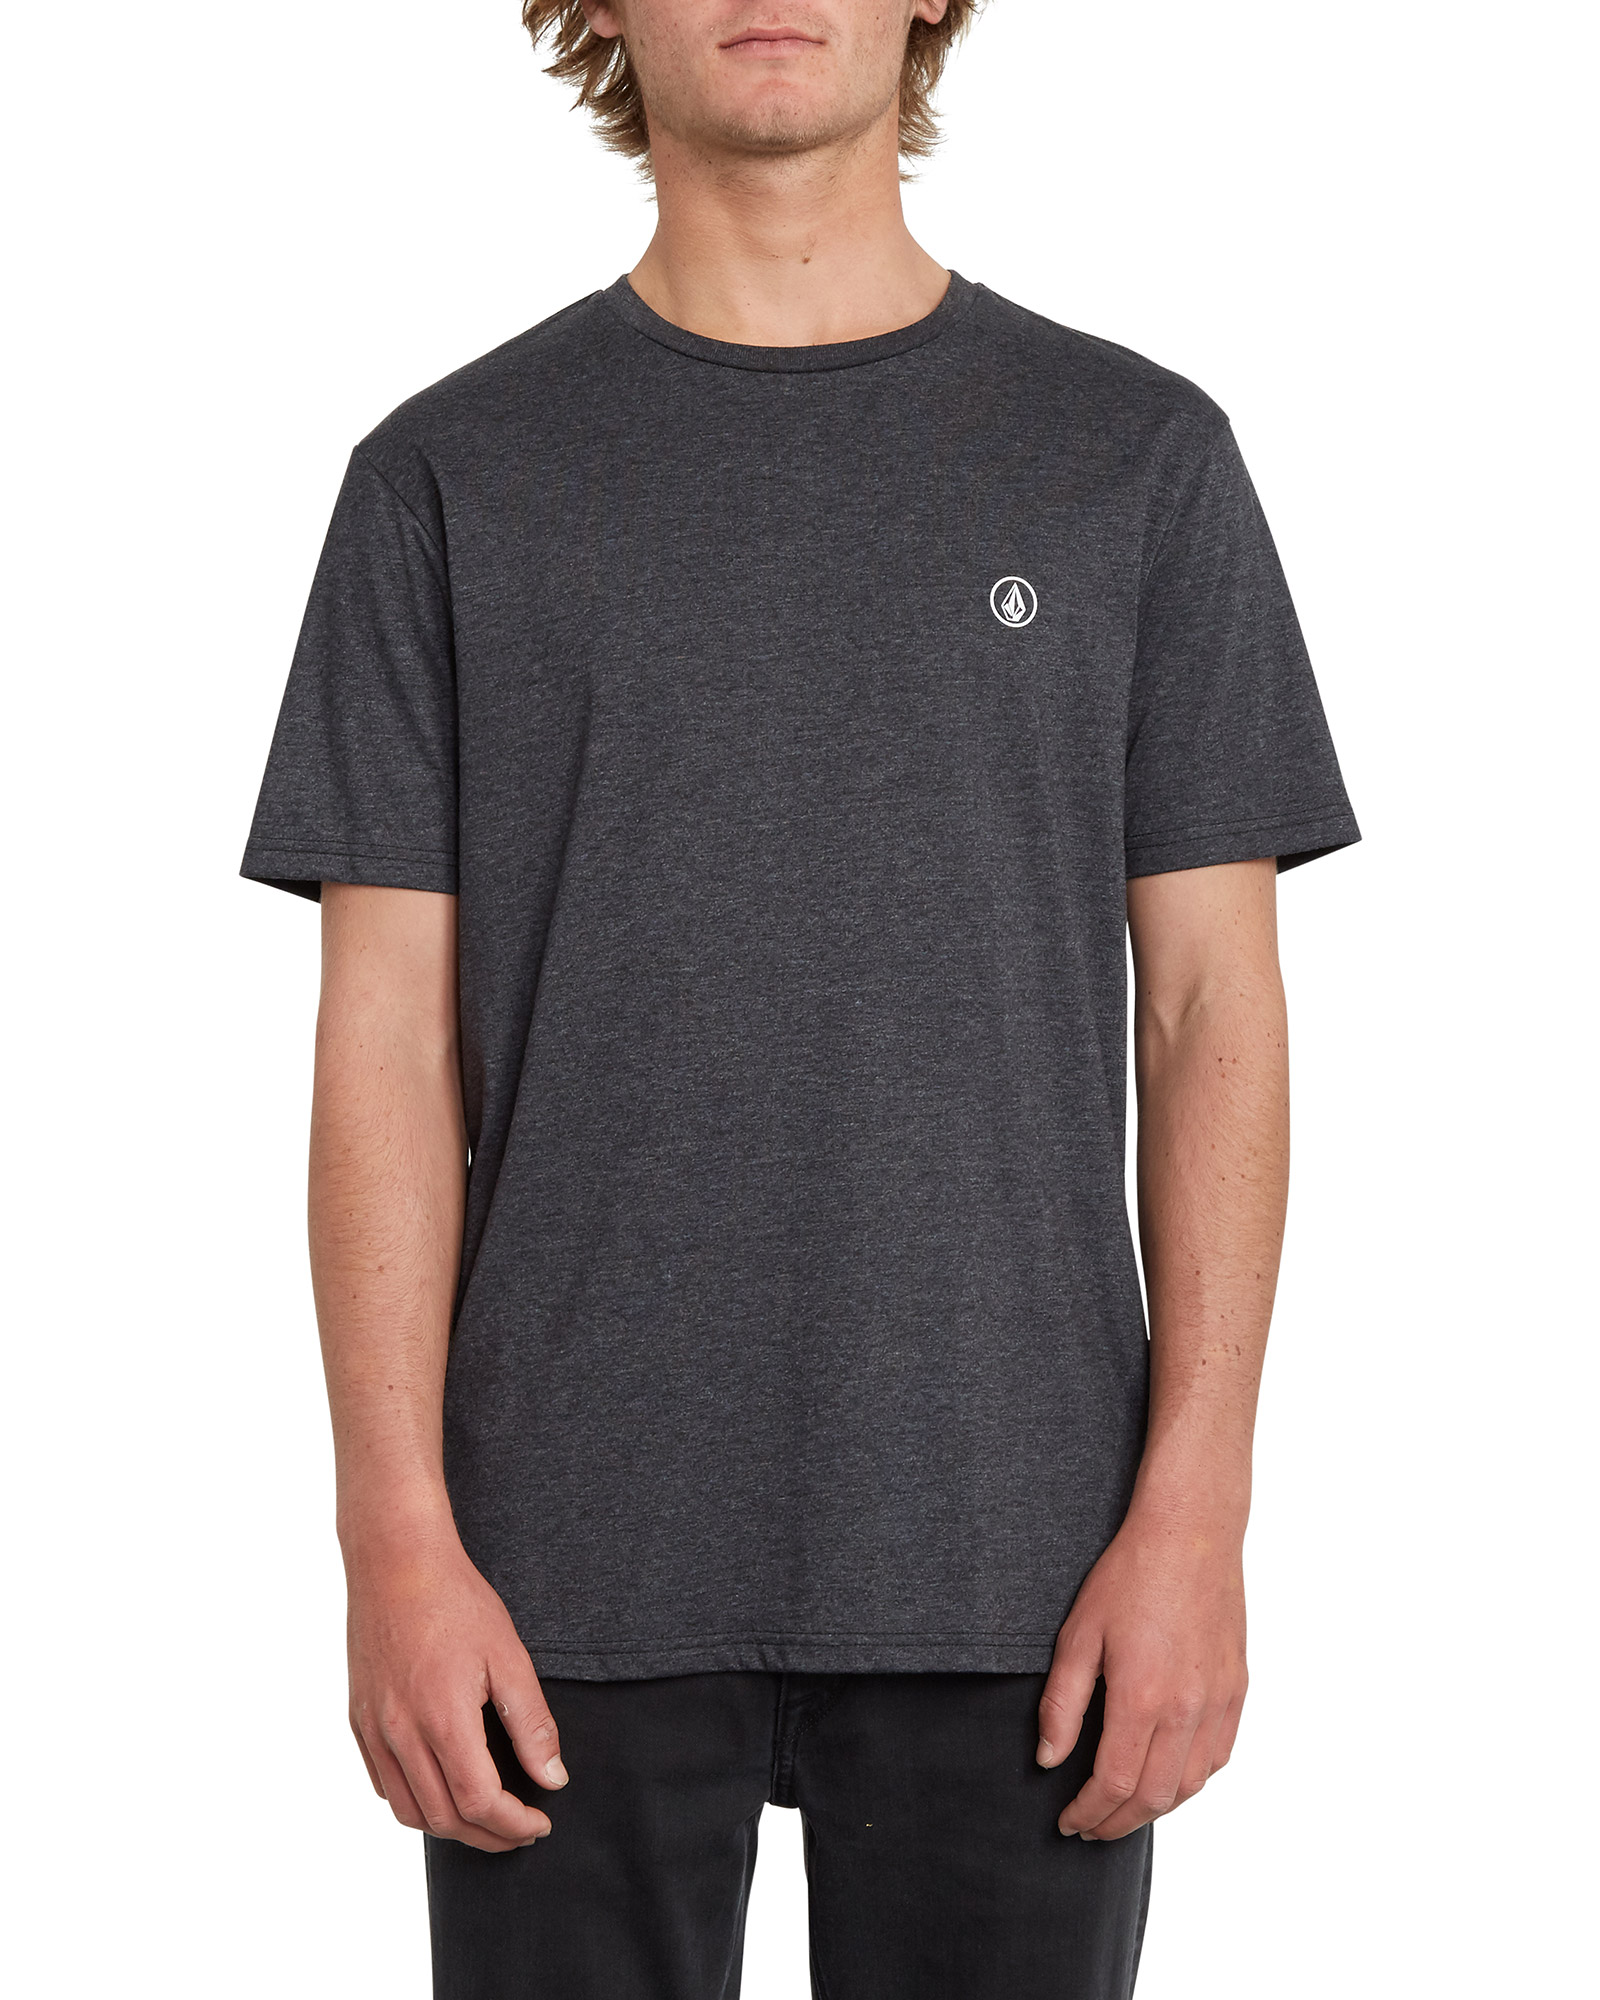 Volcom Men's Circle Blanks HTH Short Sleeve T-Shirt 0